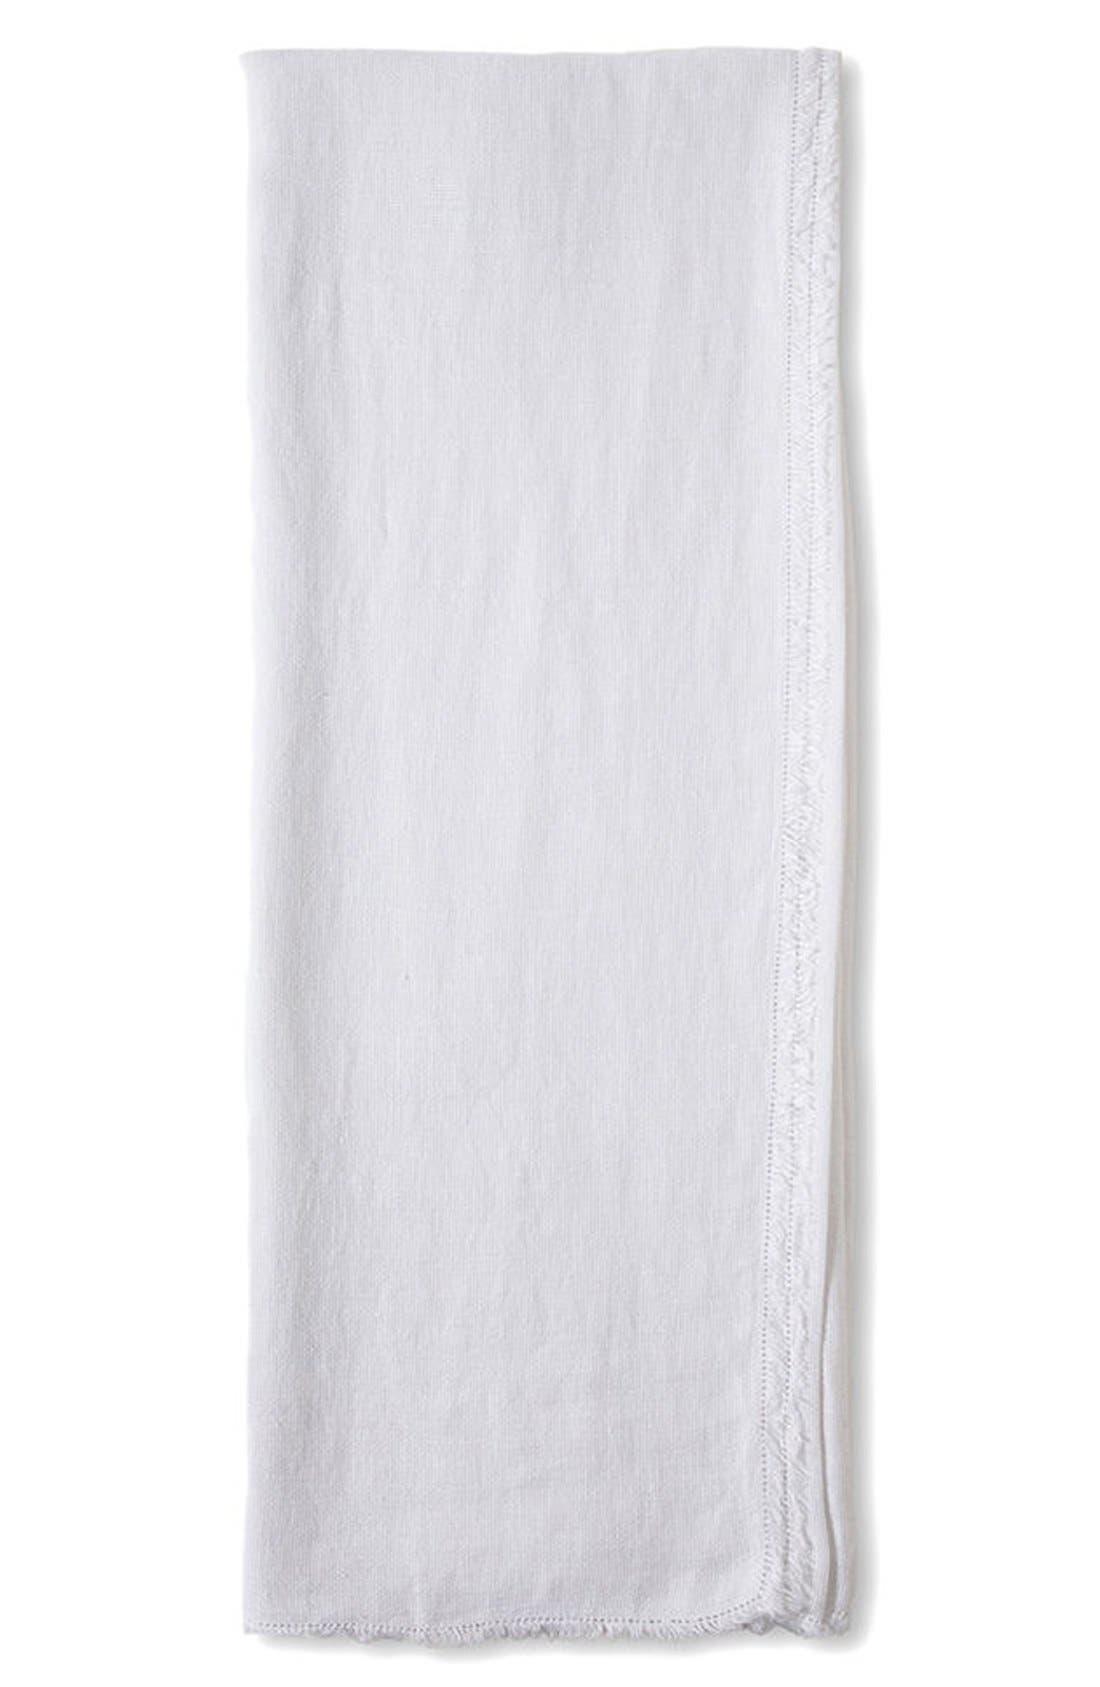 Carmel Oversize Throw Blanket,                             Main thumbnail 1, color,                             White